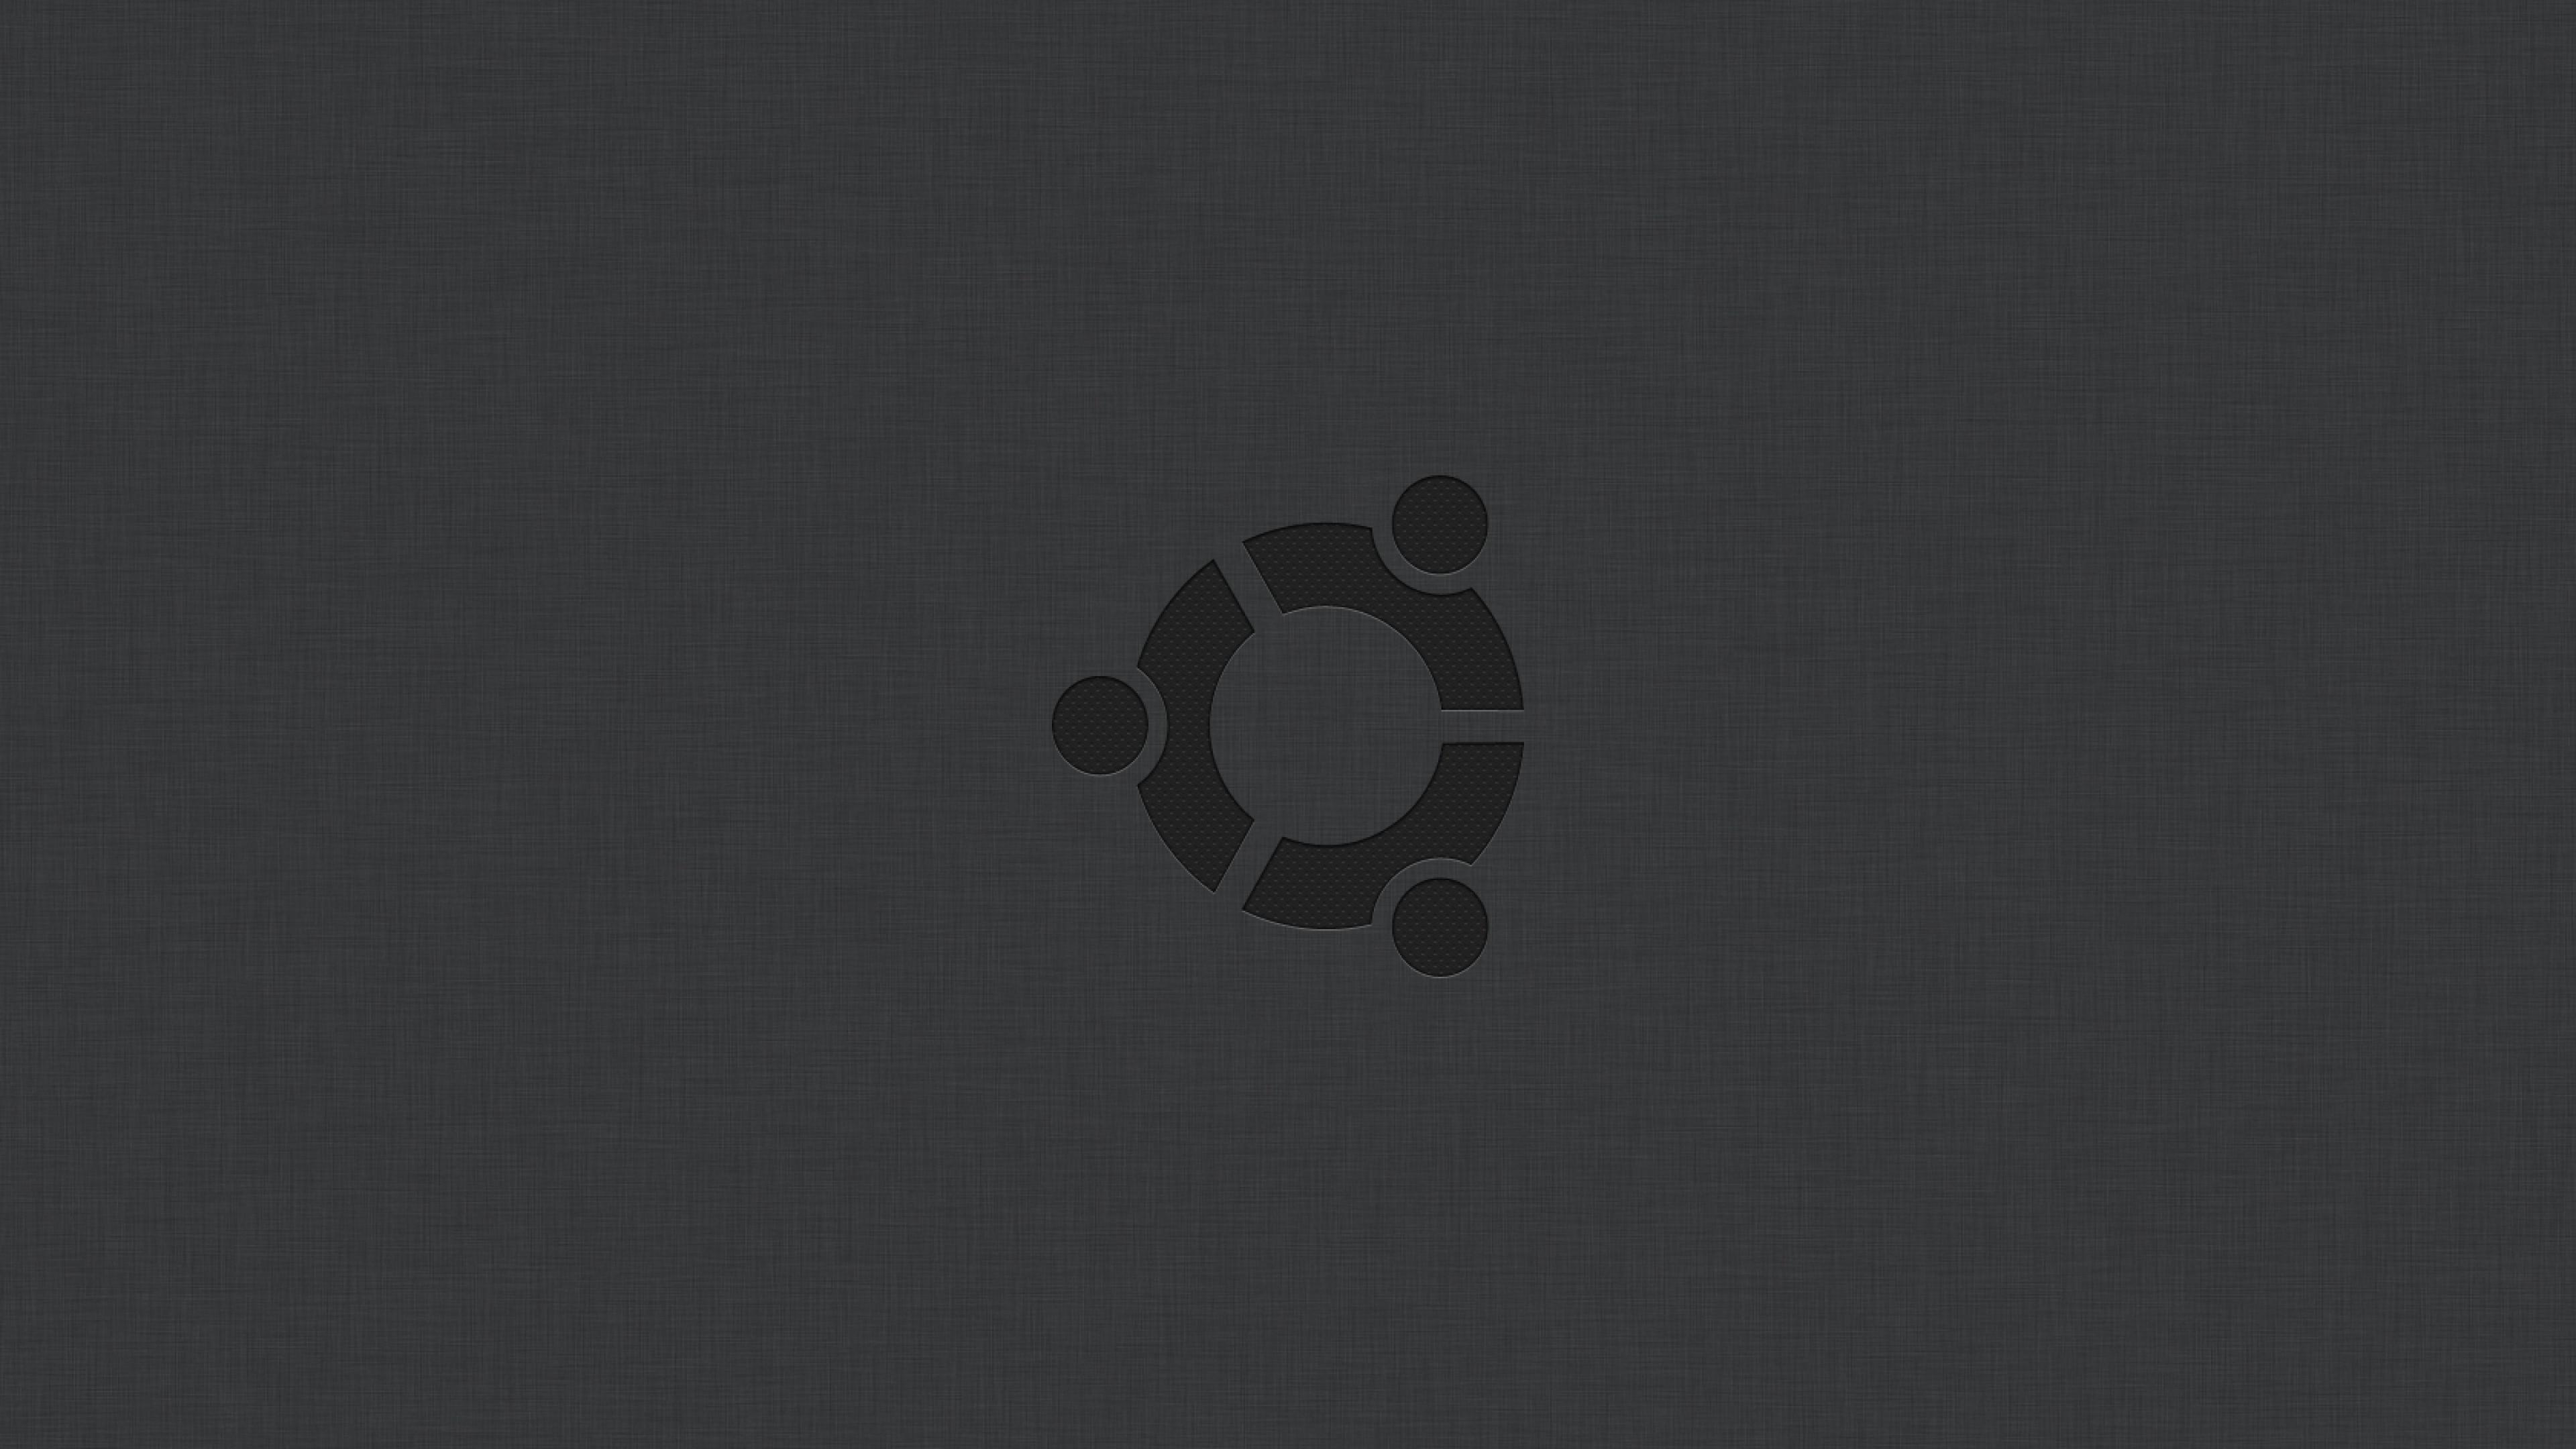 Wallpaper Ubuntu Posted By Samantha Simpson